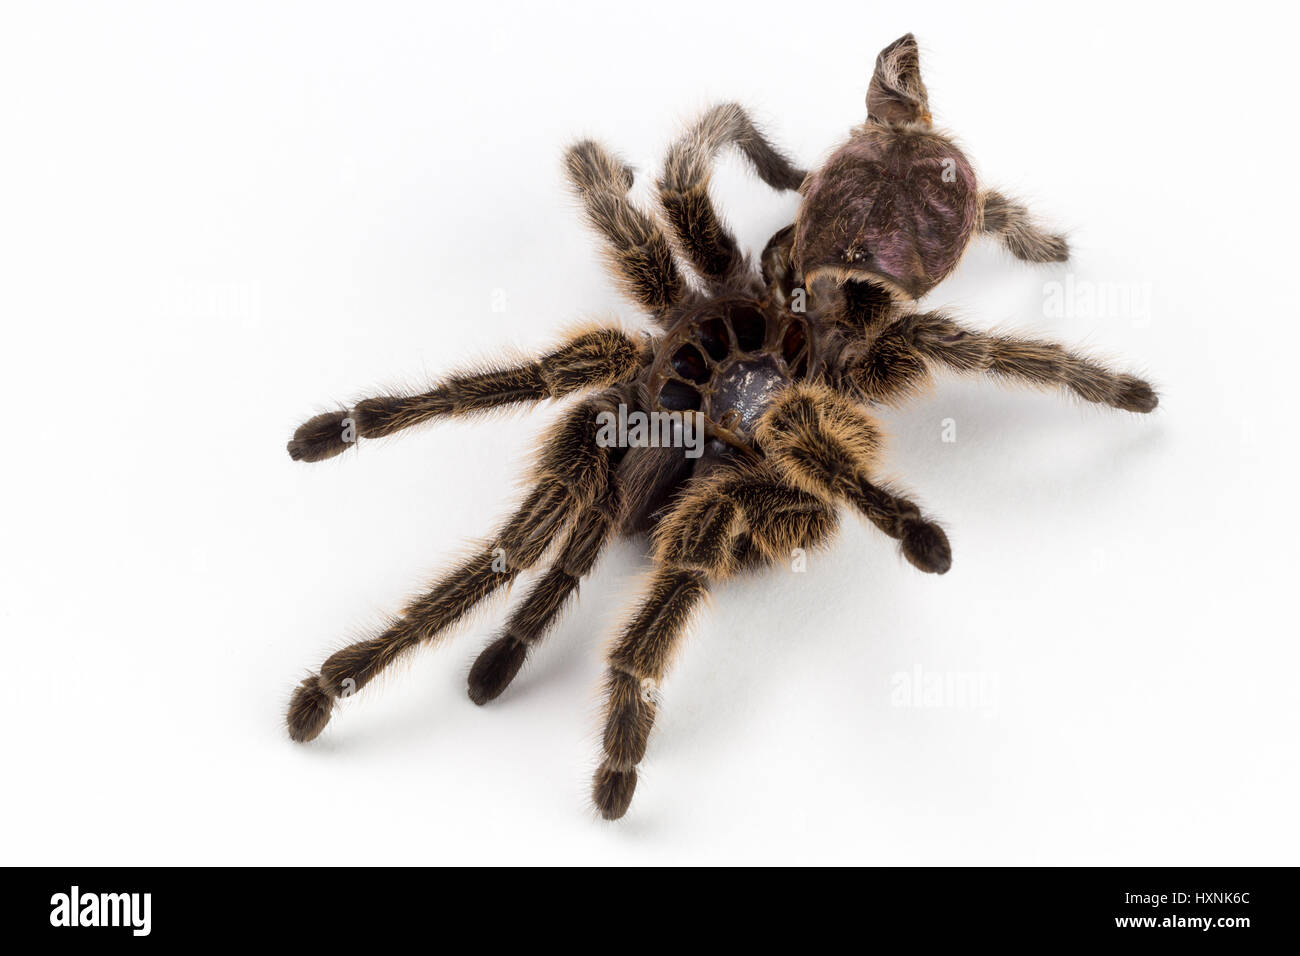 Tarantula Molt Rose Haired Spider Stock Photo 136929700 Alamy